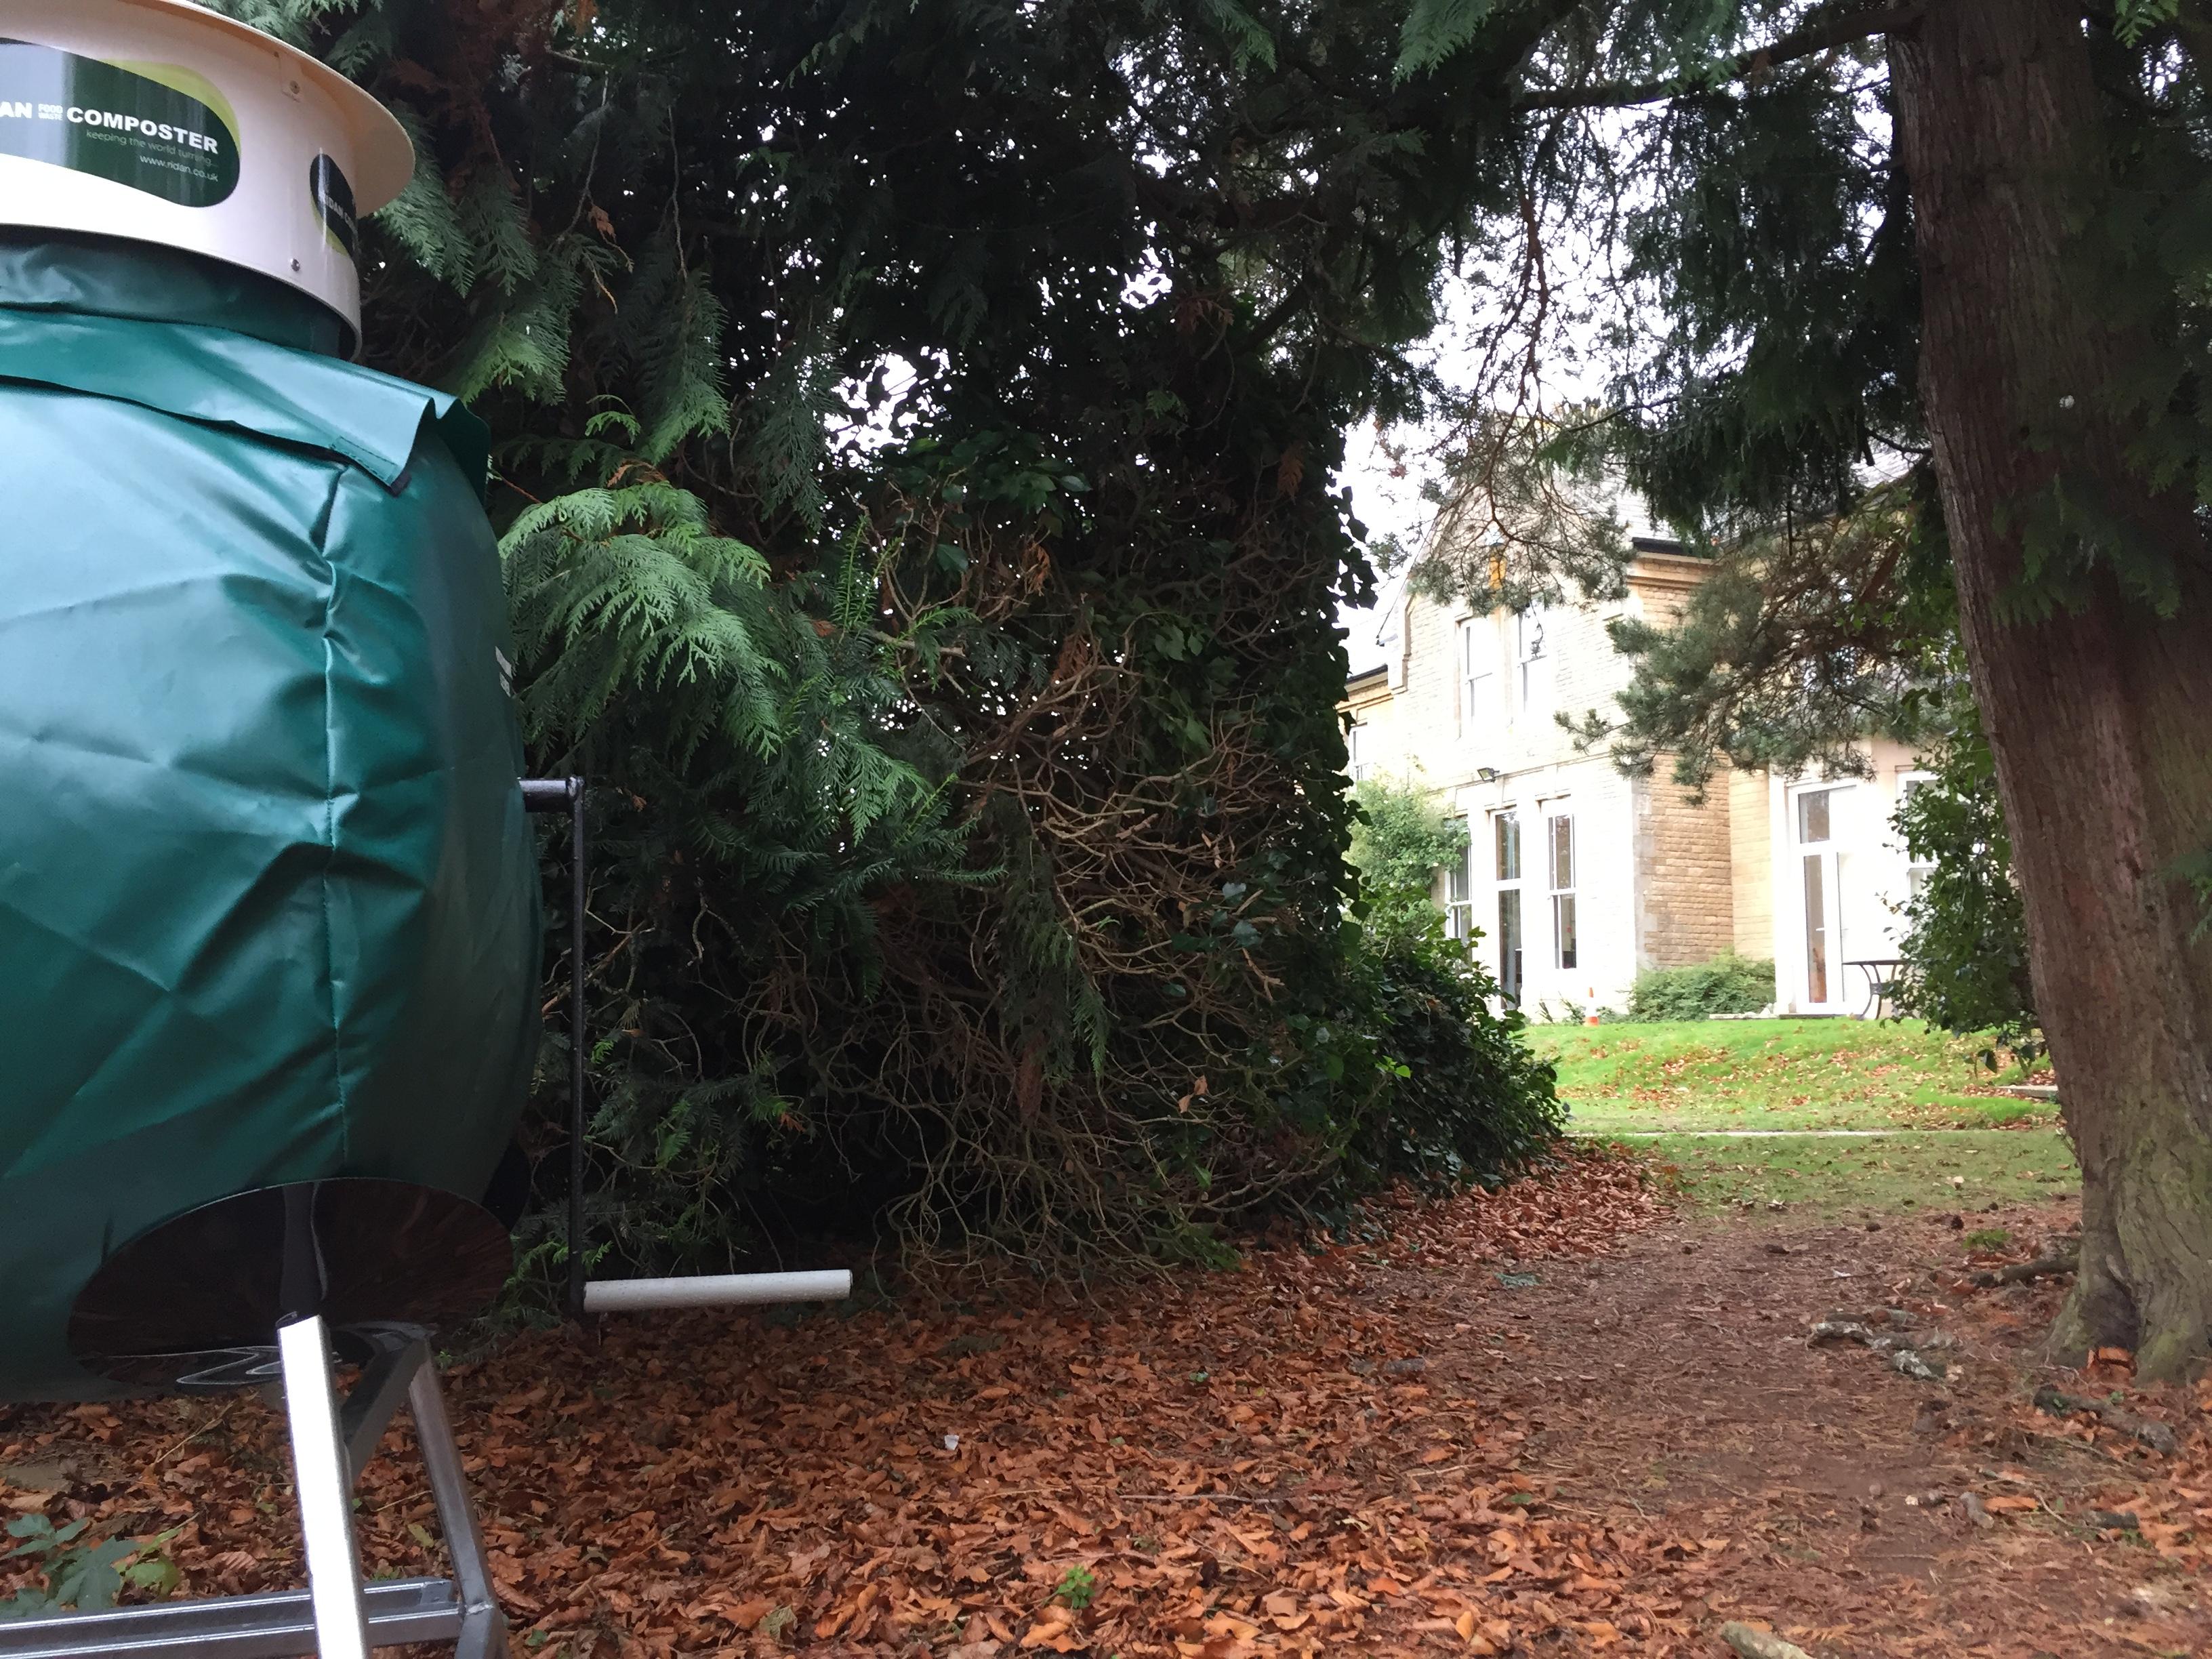 Food waste composter Ridan